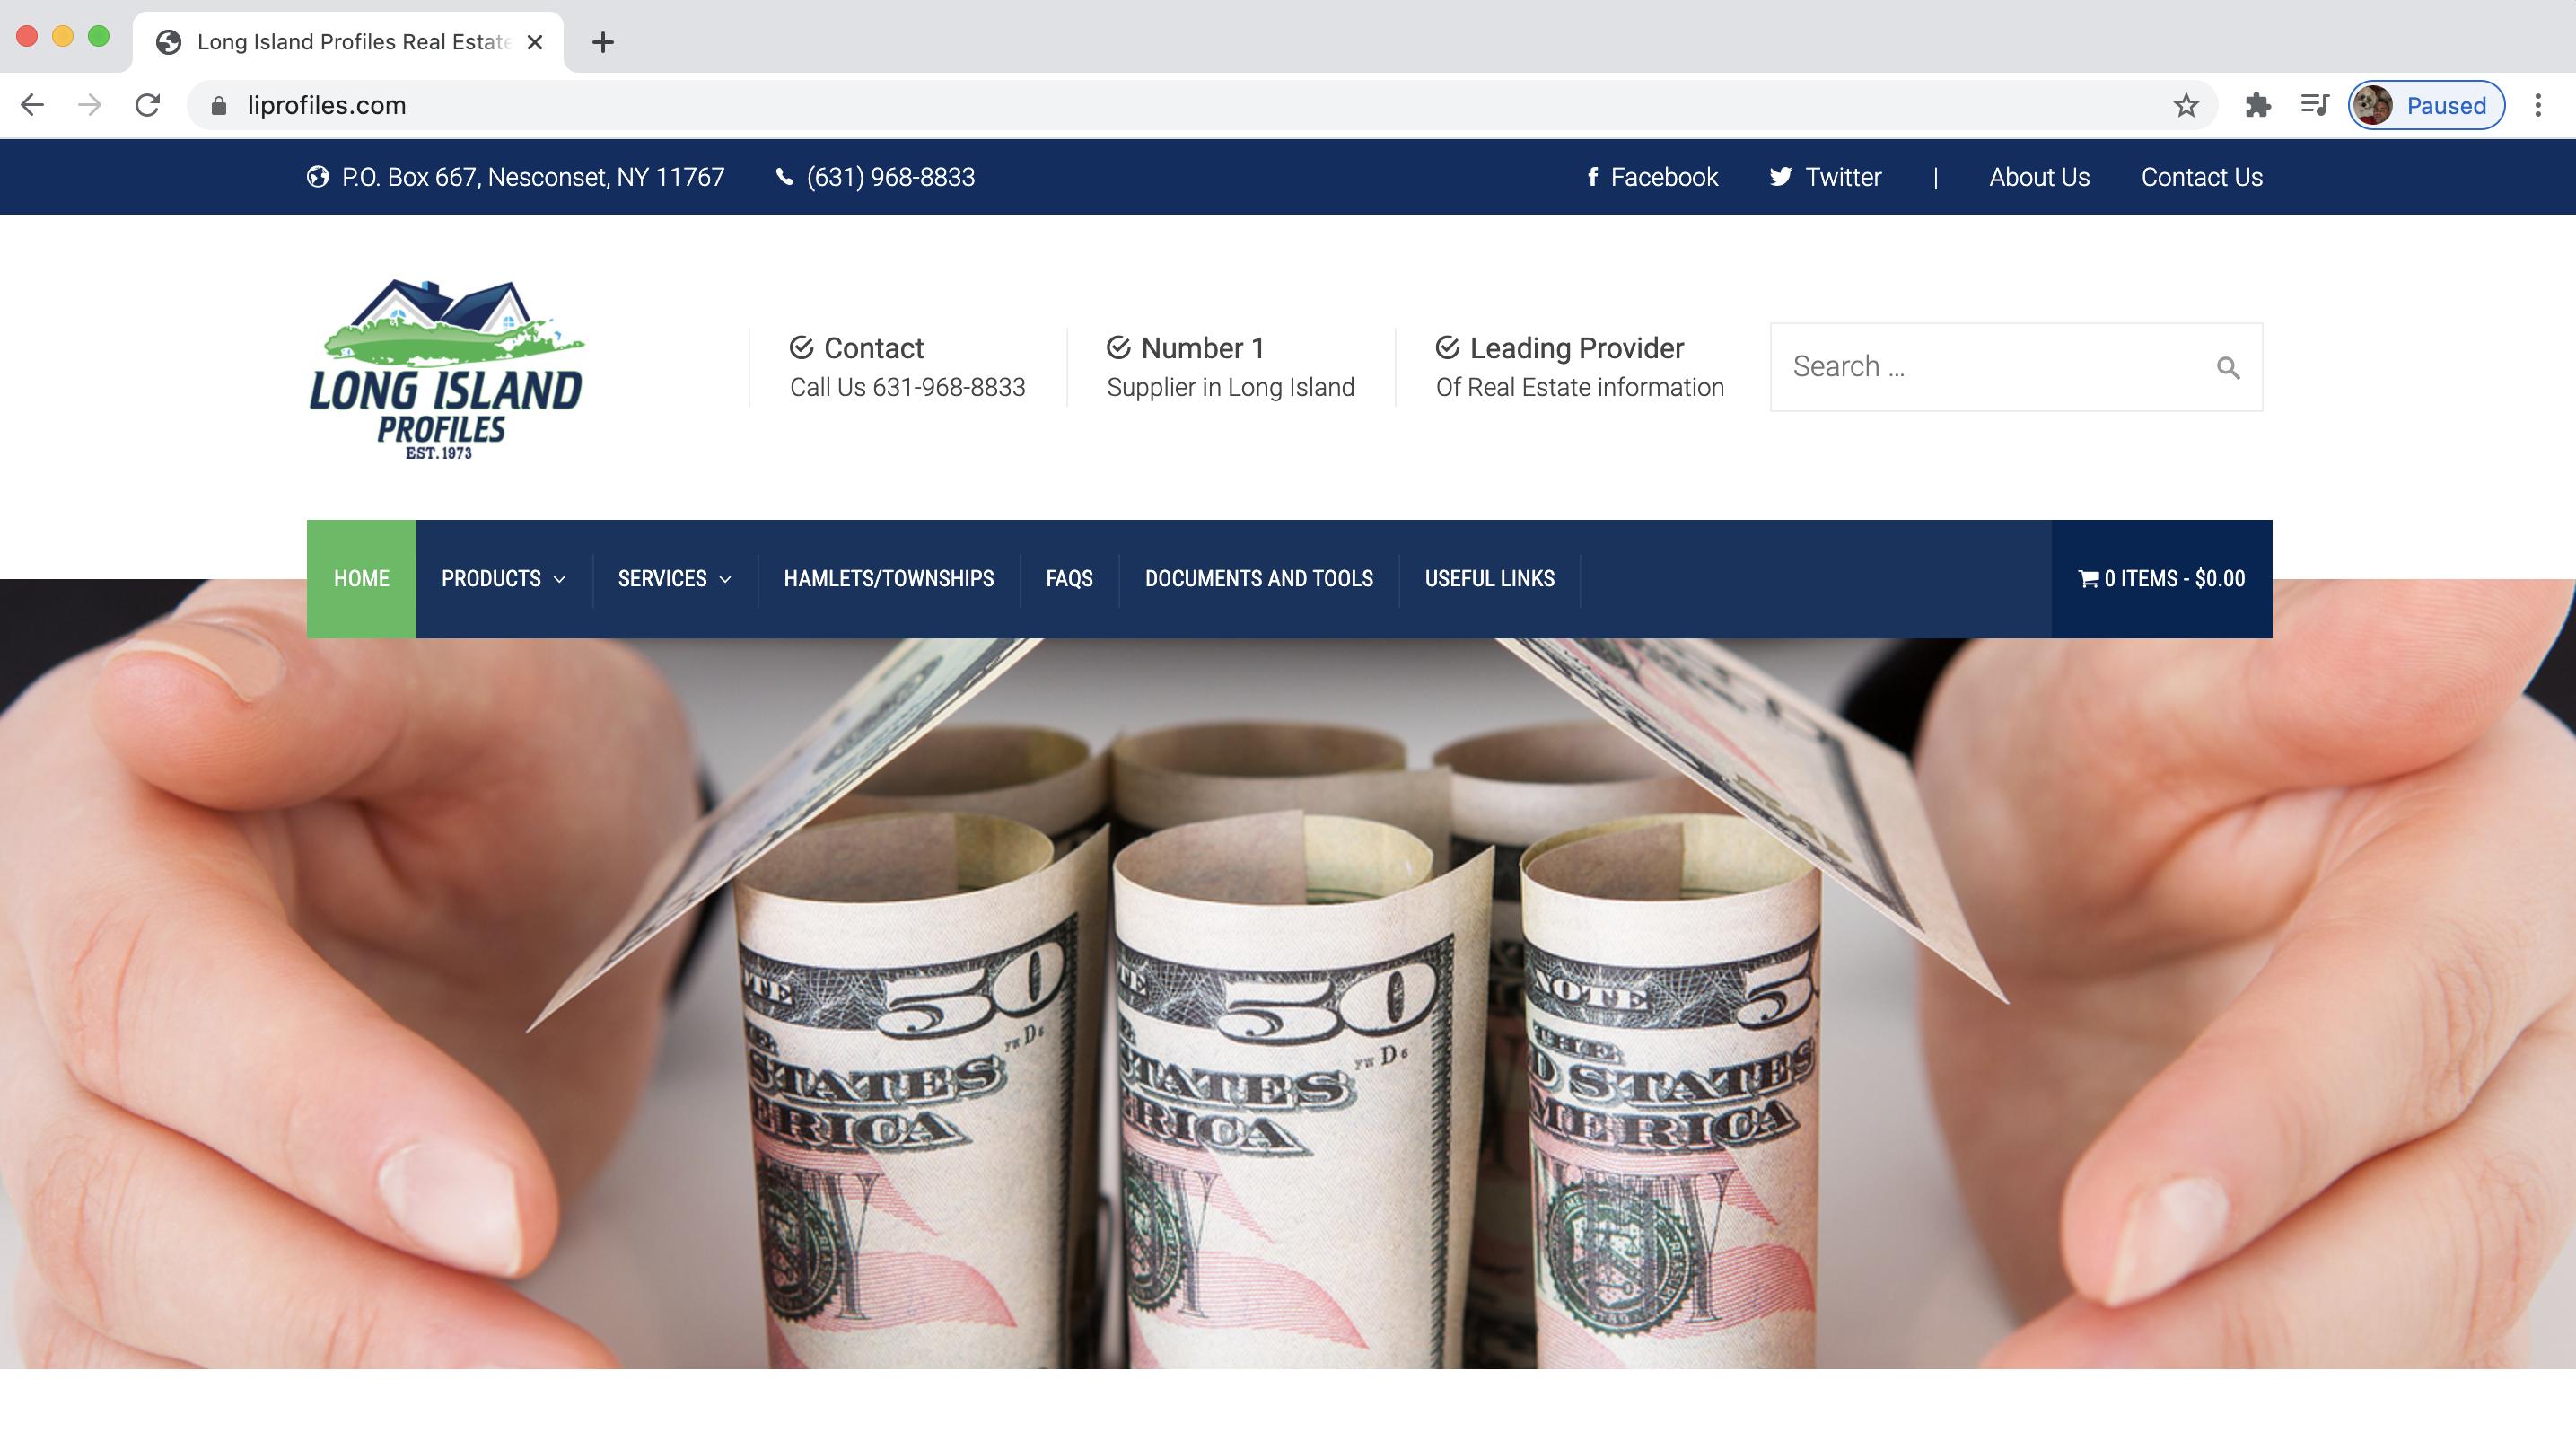 LI Profiles Design New Logo And Website